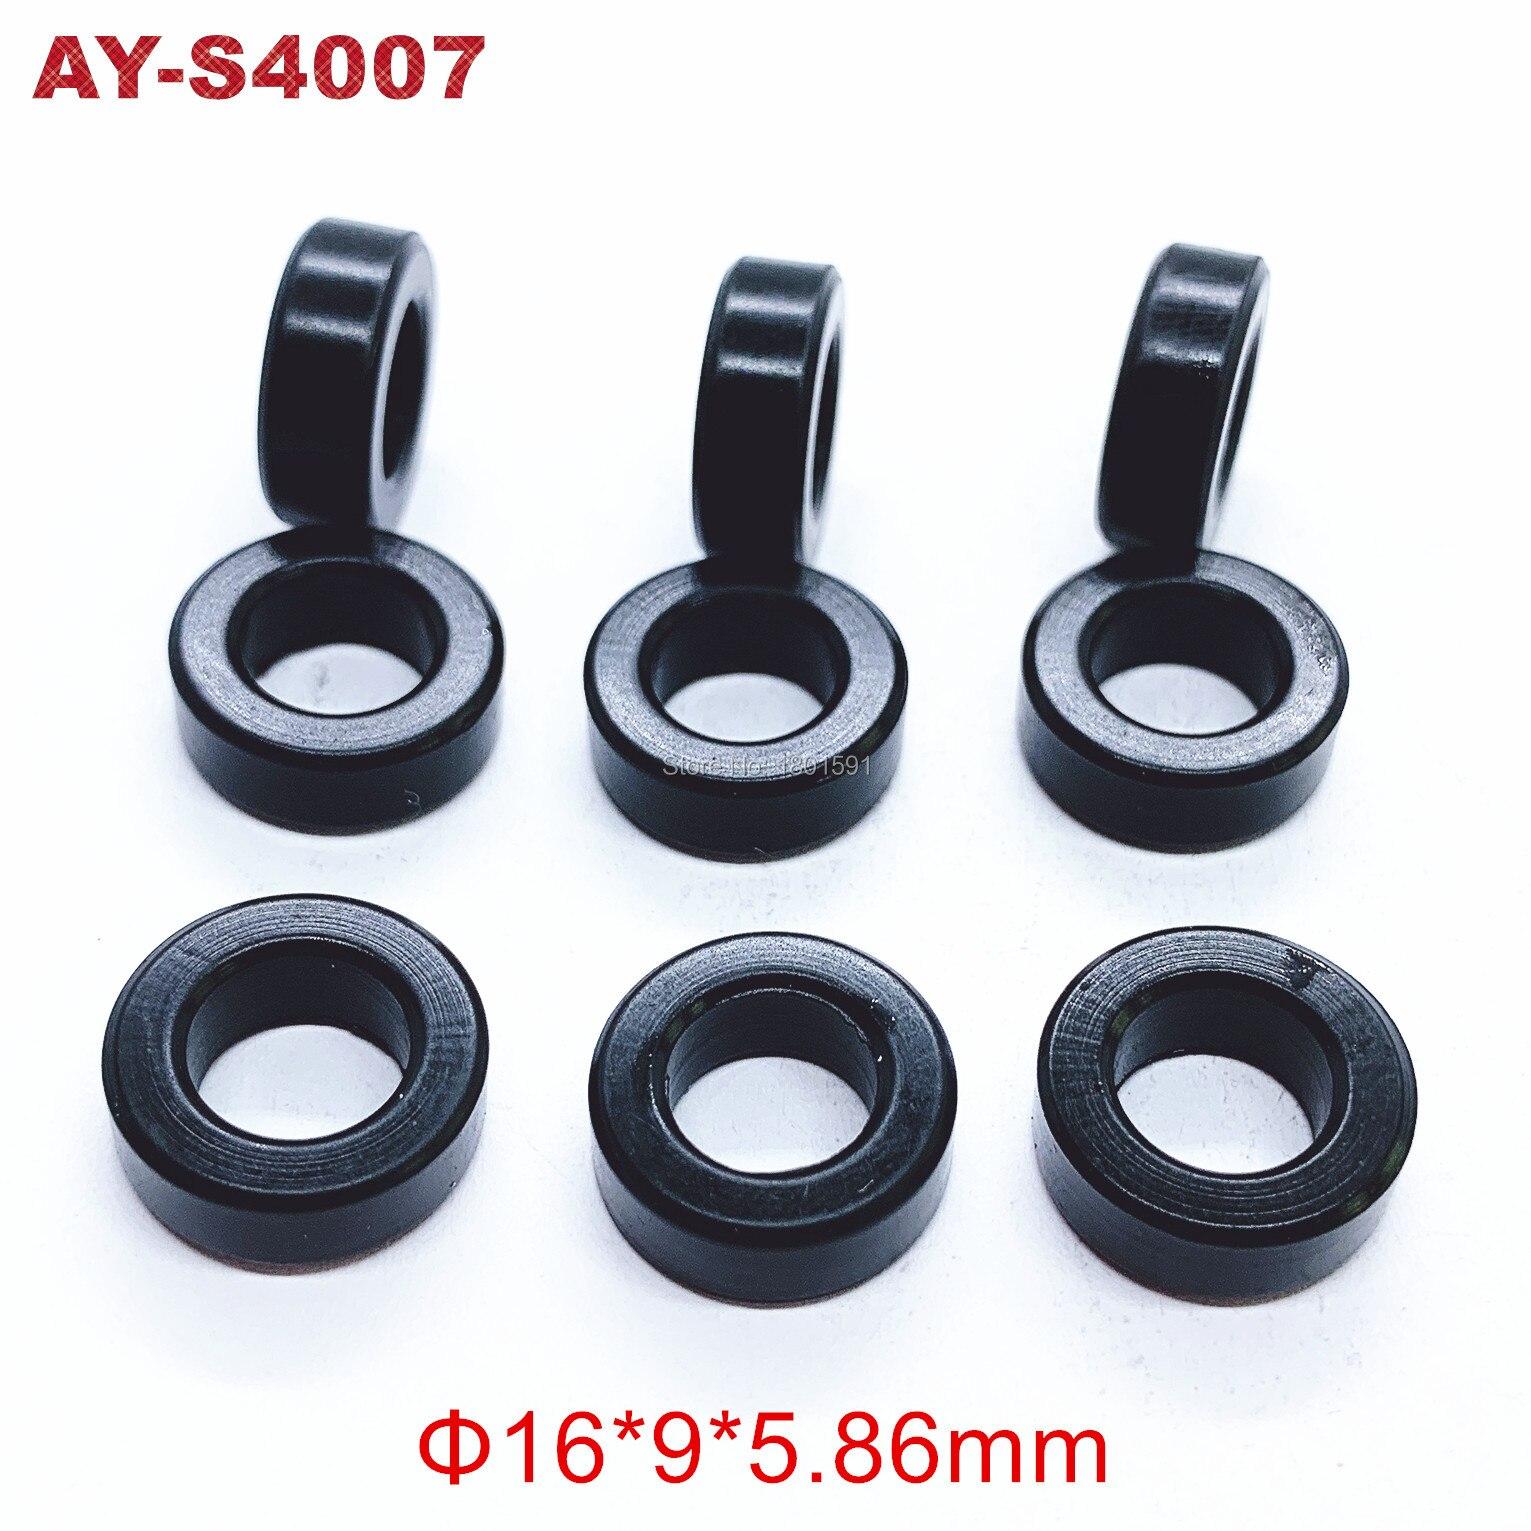 200 stück well gummi dichtungen oring 16*9*5,8mm für toyota kraftstoff injektor reparatur kits (AY-S4007)